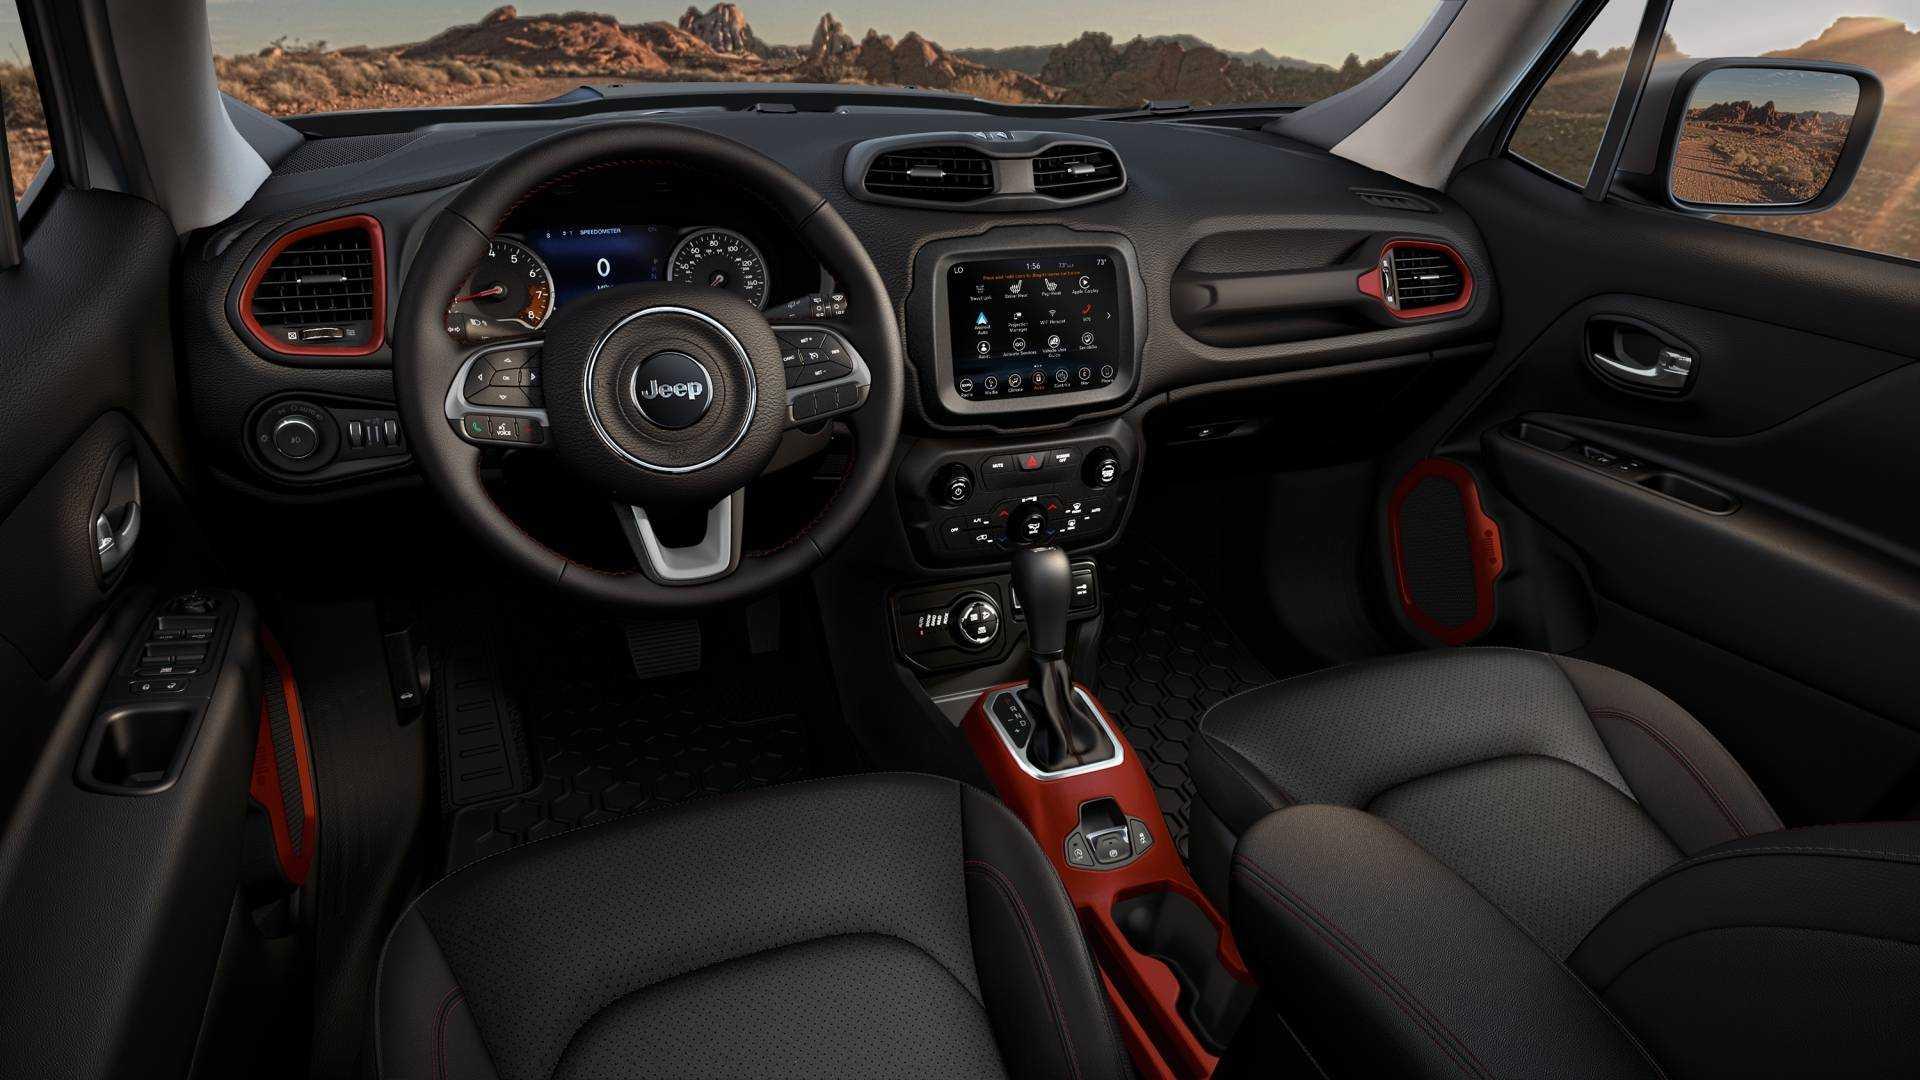 https://cdn.motor1.com/images/mgl/M20xm/s6/jeep-renegade-2019-eua.jpg